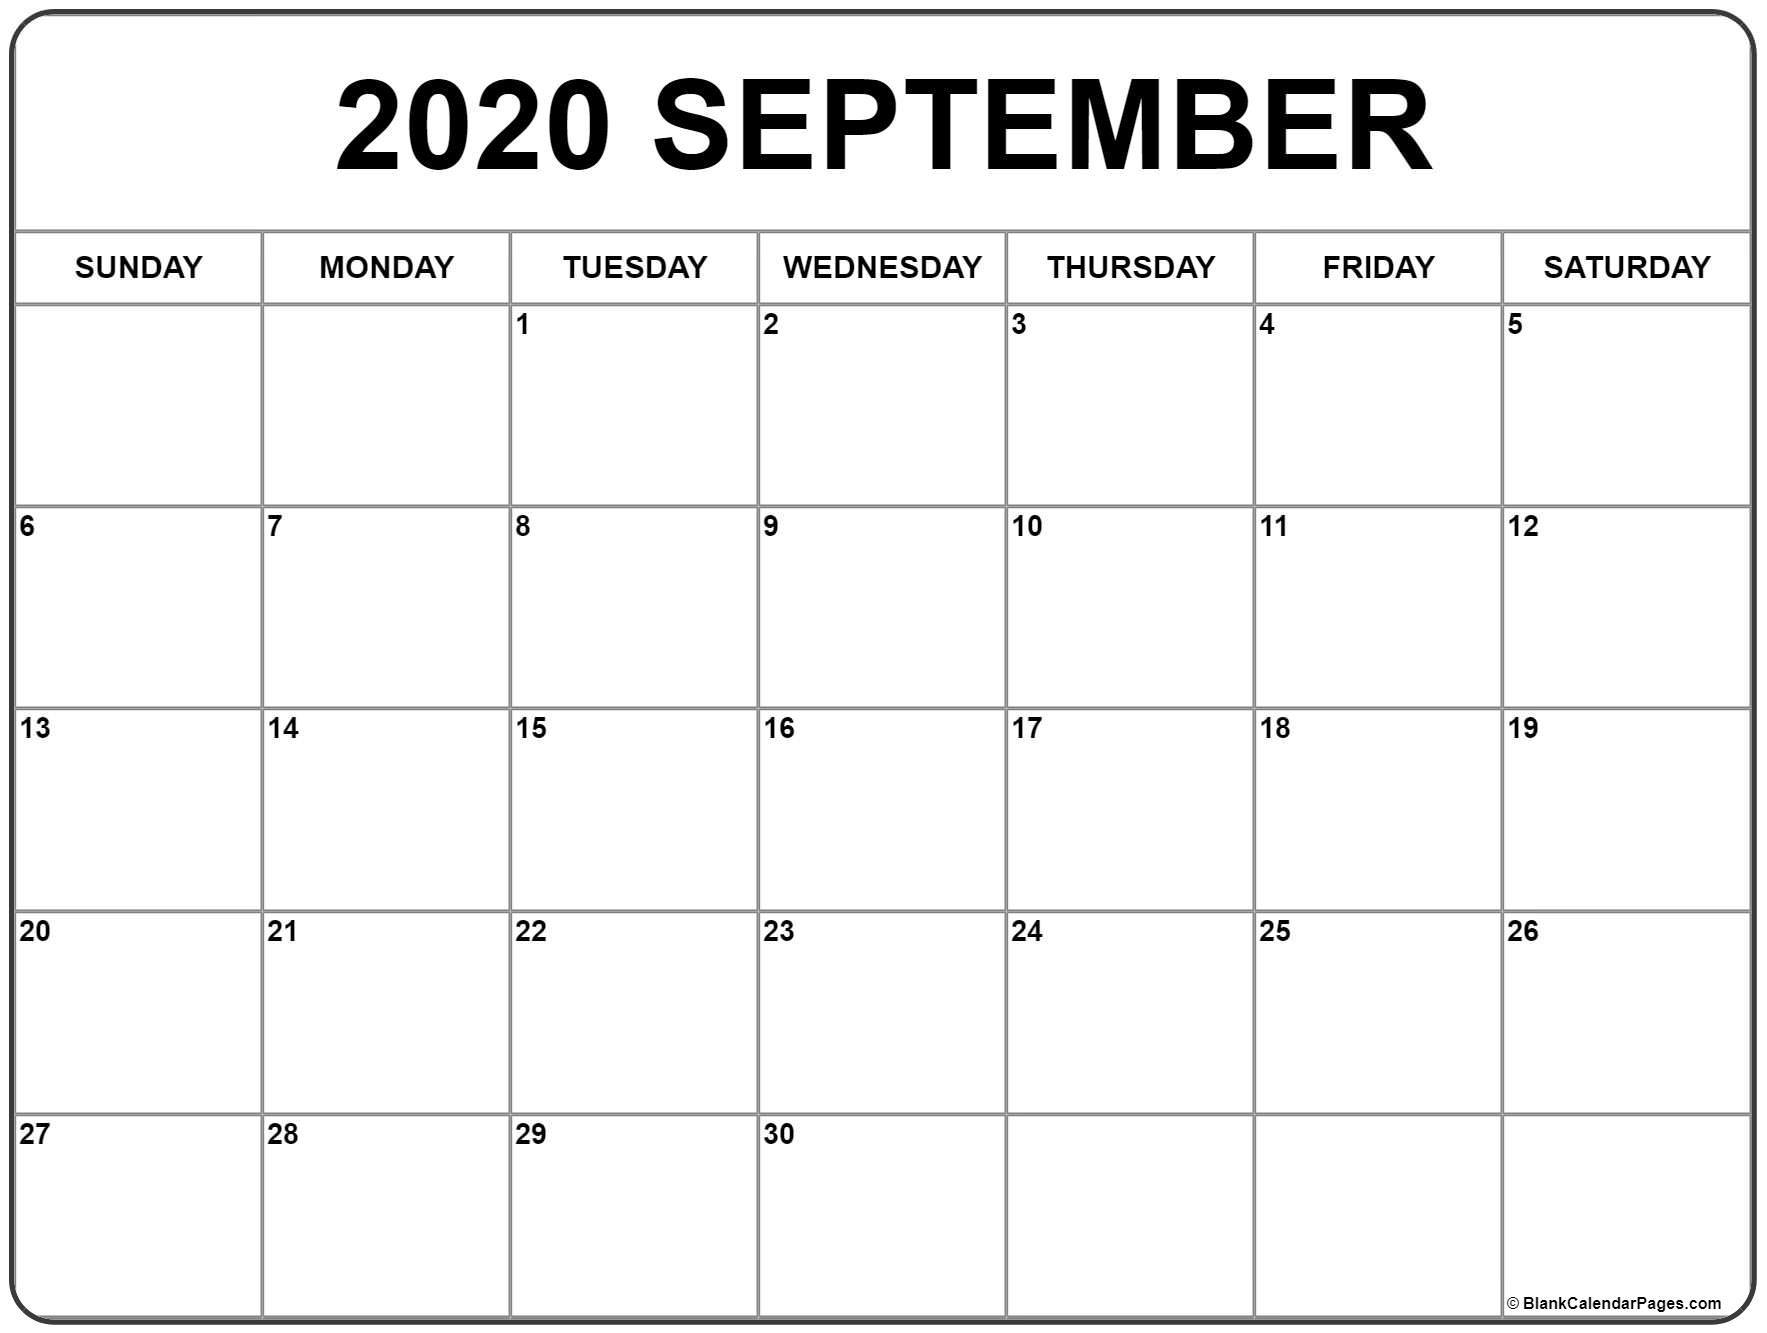 September 2020 Calendar | Free Printable Monthly Calendars-Google Calendar September 2020 Template